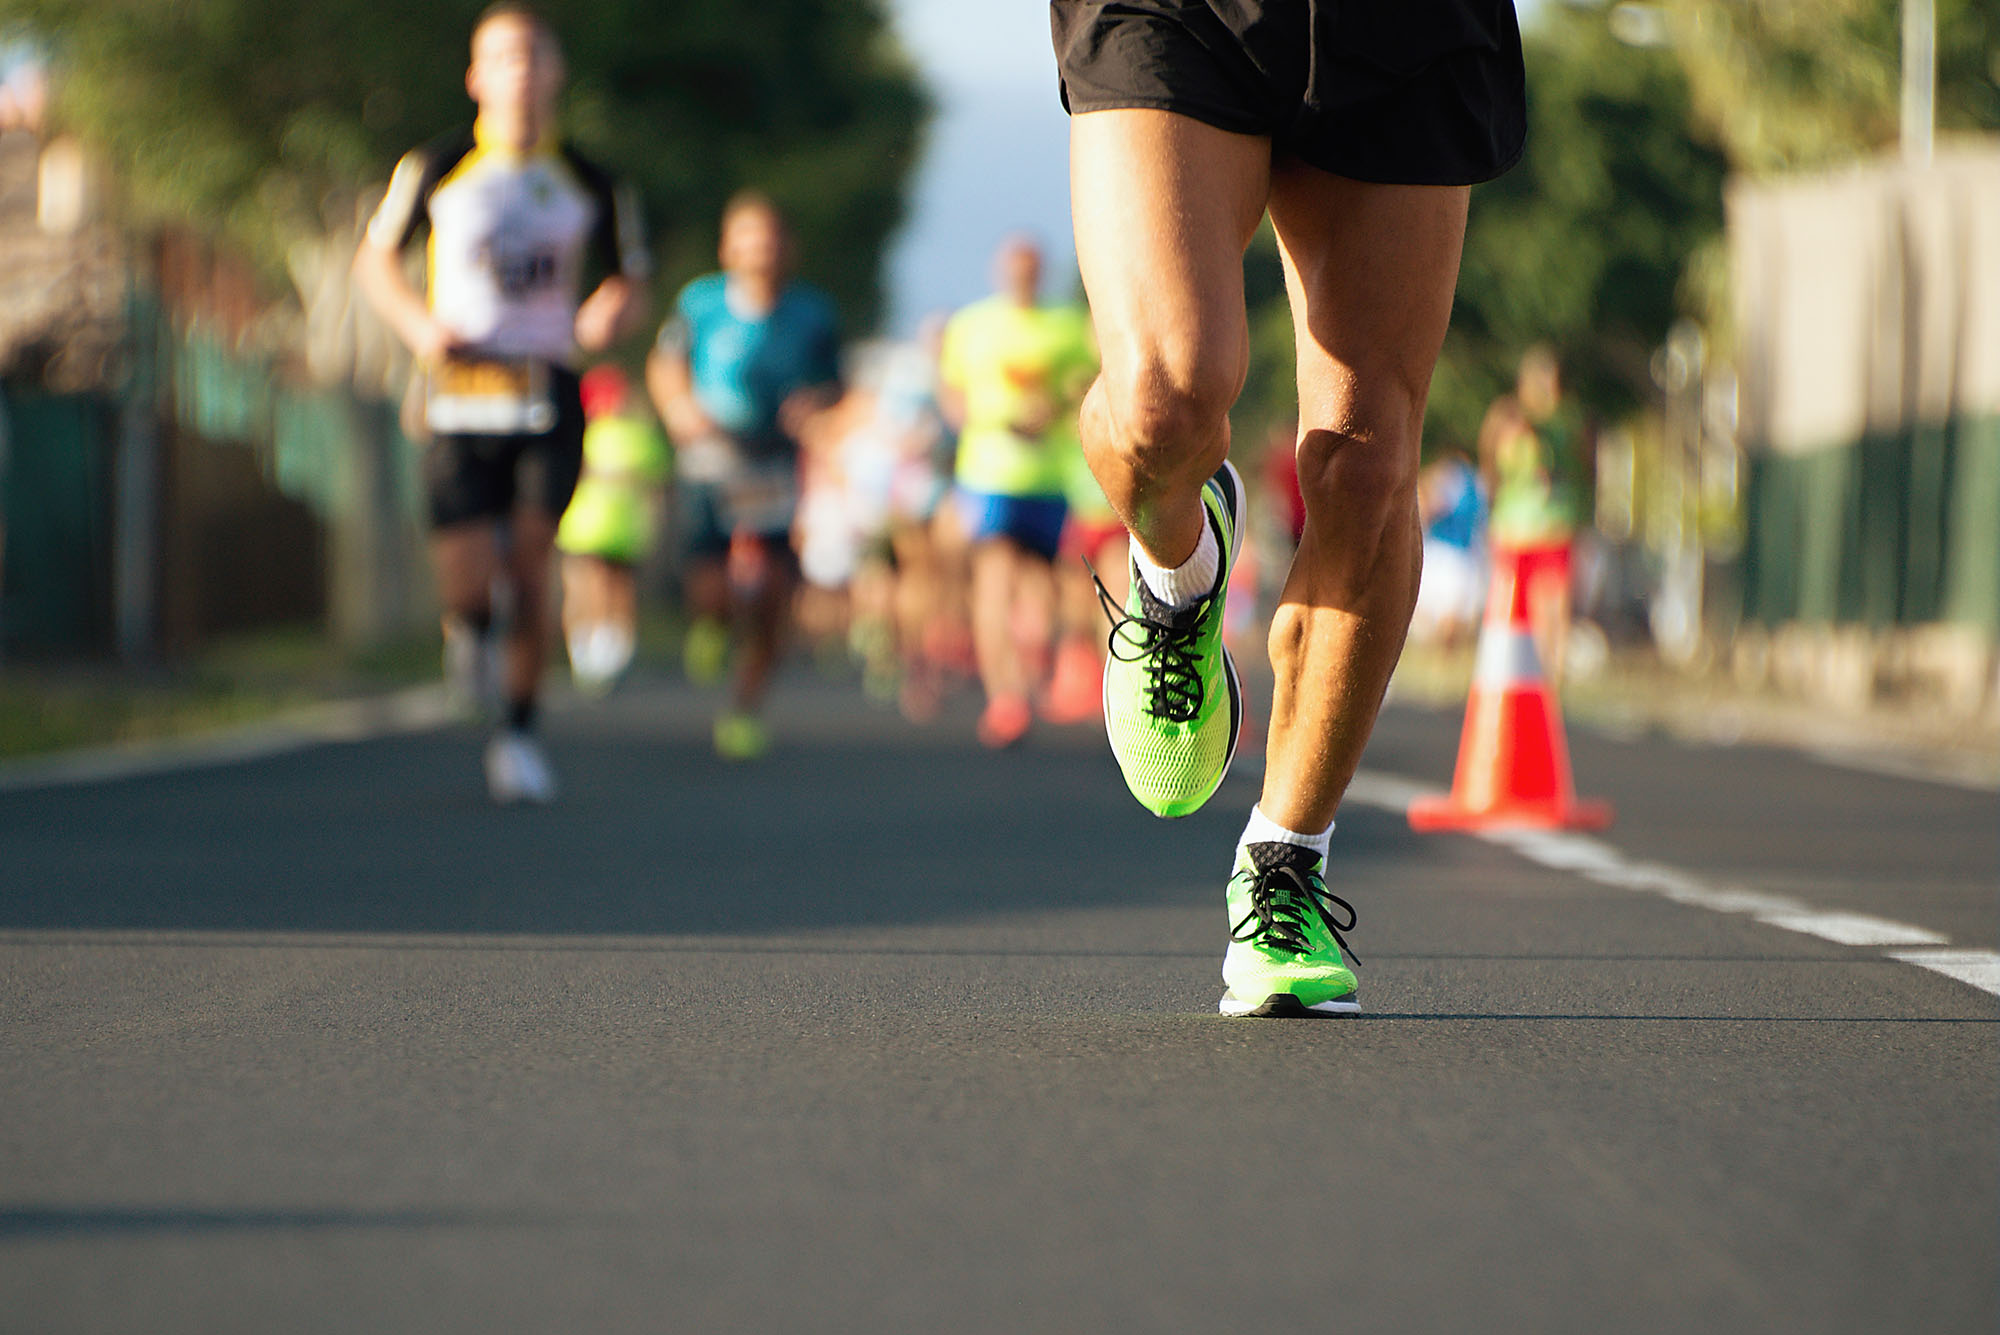 Holmestrand Maraton 21. August 2021!